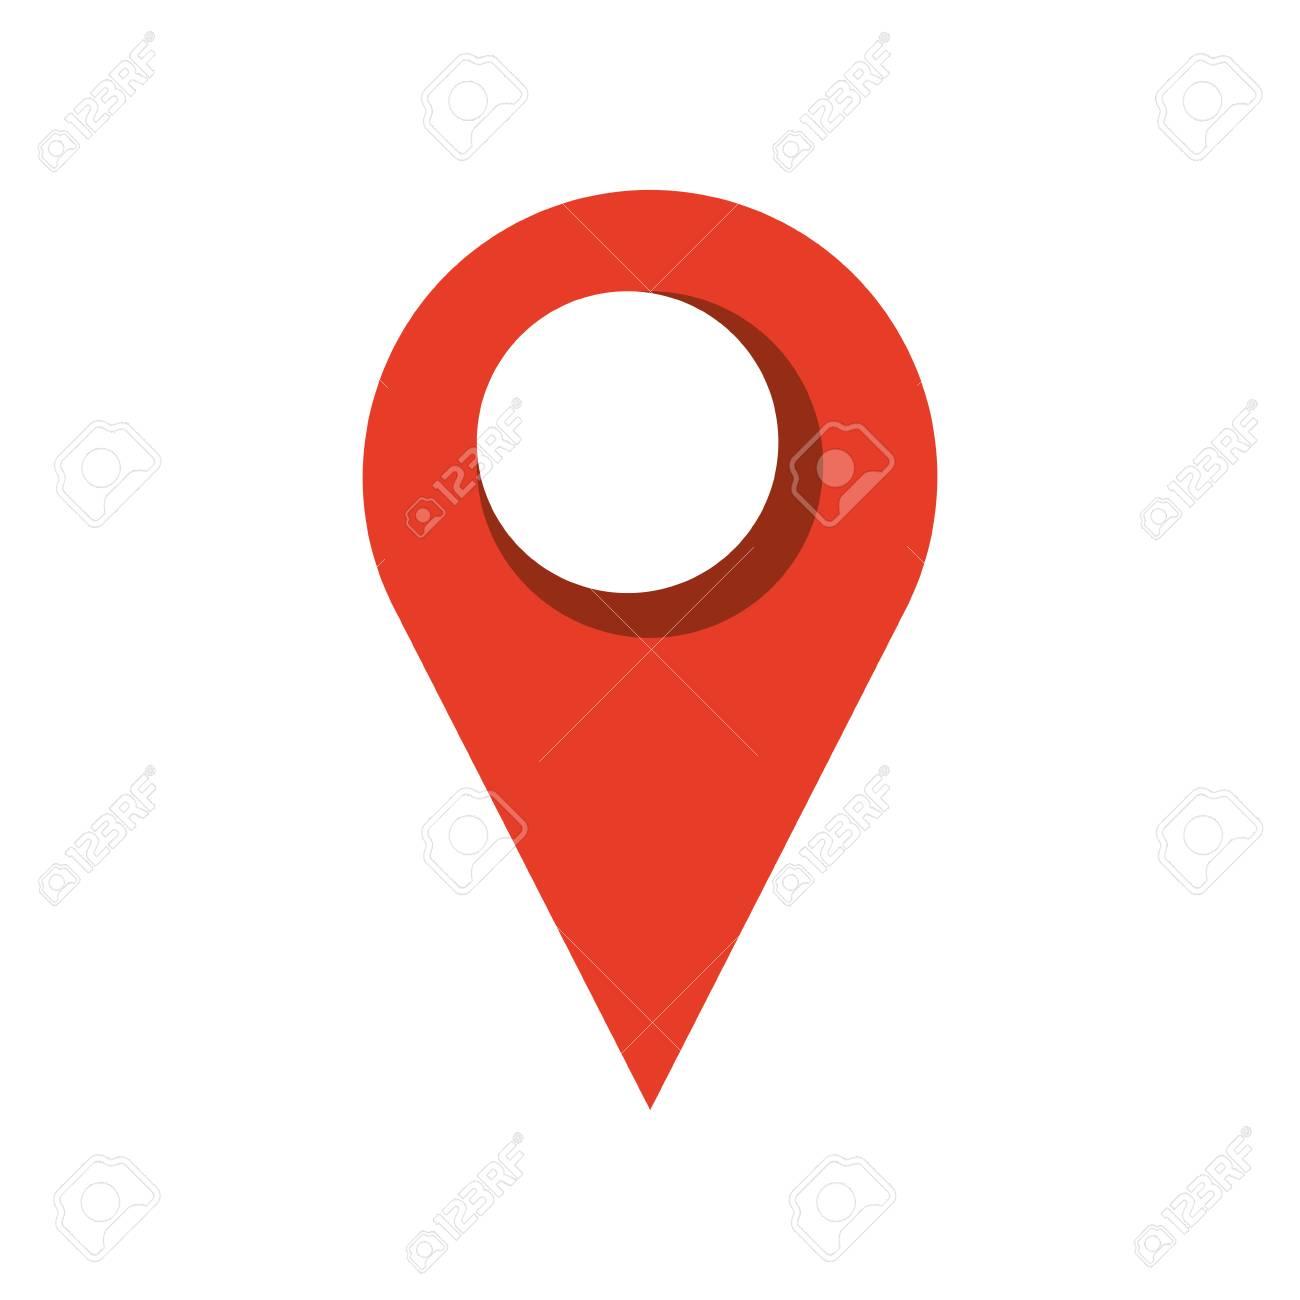 Pointer map location symbol icon vector illustration graphic.. on phone symbol, services symbol, print symbol, level symbol, world wide web symbol, links symbol, map place symbol, map key symbols, menu symbol, map locator symbol, check in symbol, time symbol, map scale symbol, map distance symbol, map pin icon, sign you are here symbol, name symbol, about us symbol, area symbol, map locator icon,